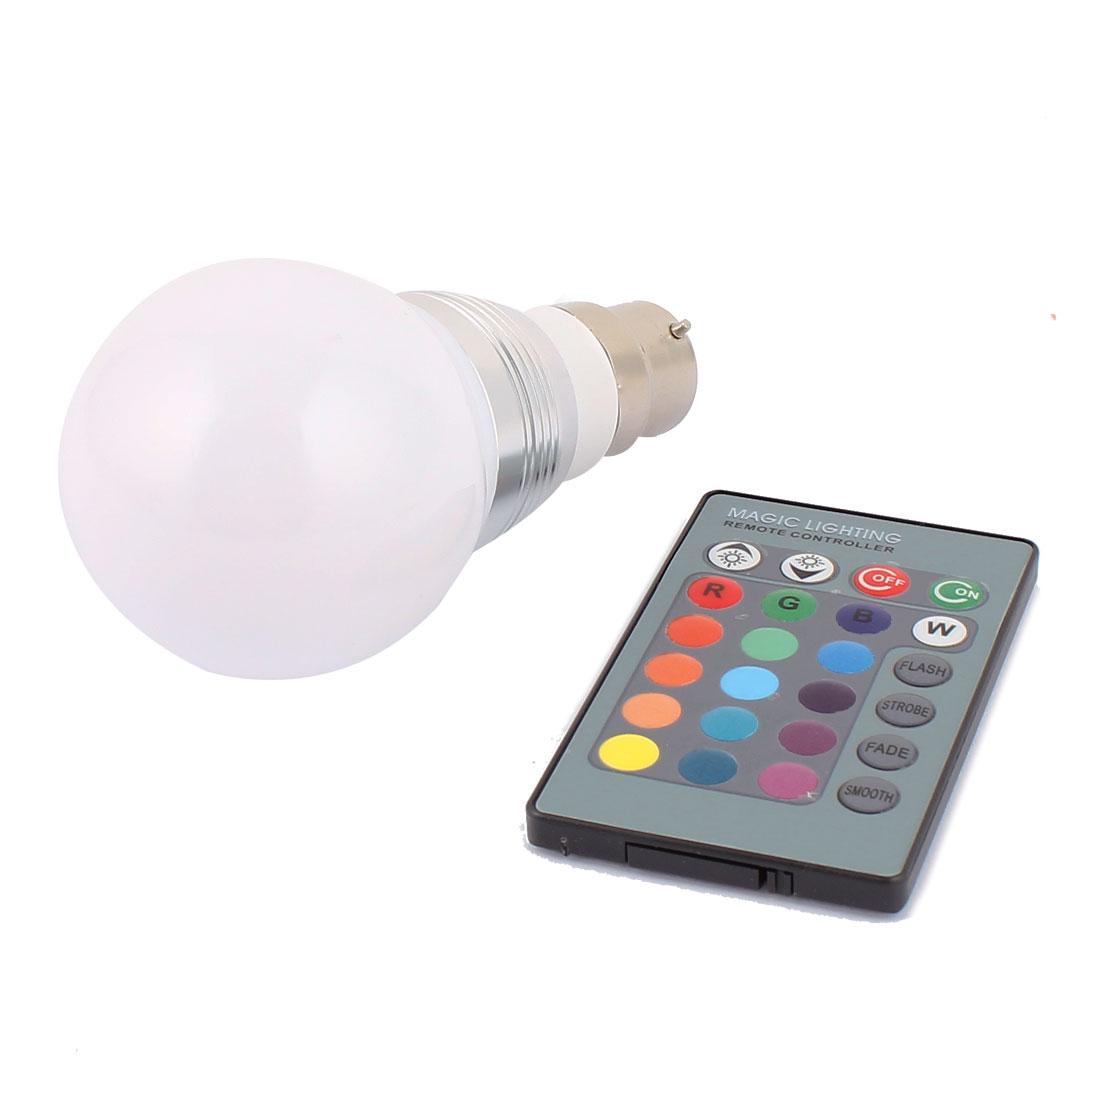 B22 16 Colors Change Ball Light RGB LED Lamp Bulb 3W AC85-265V w Remote Controller